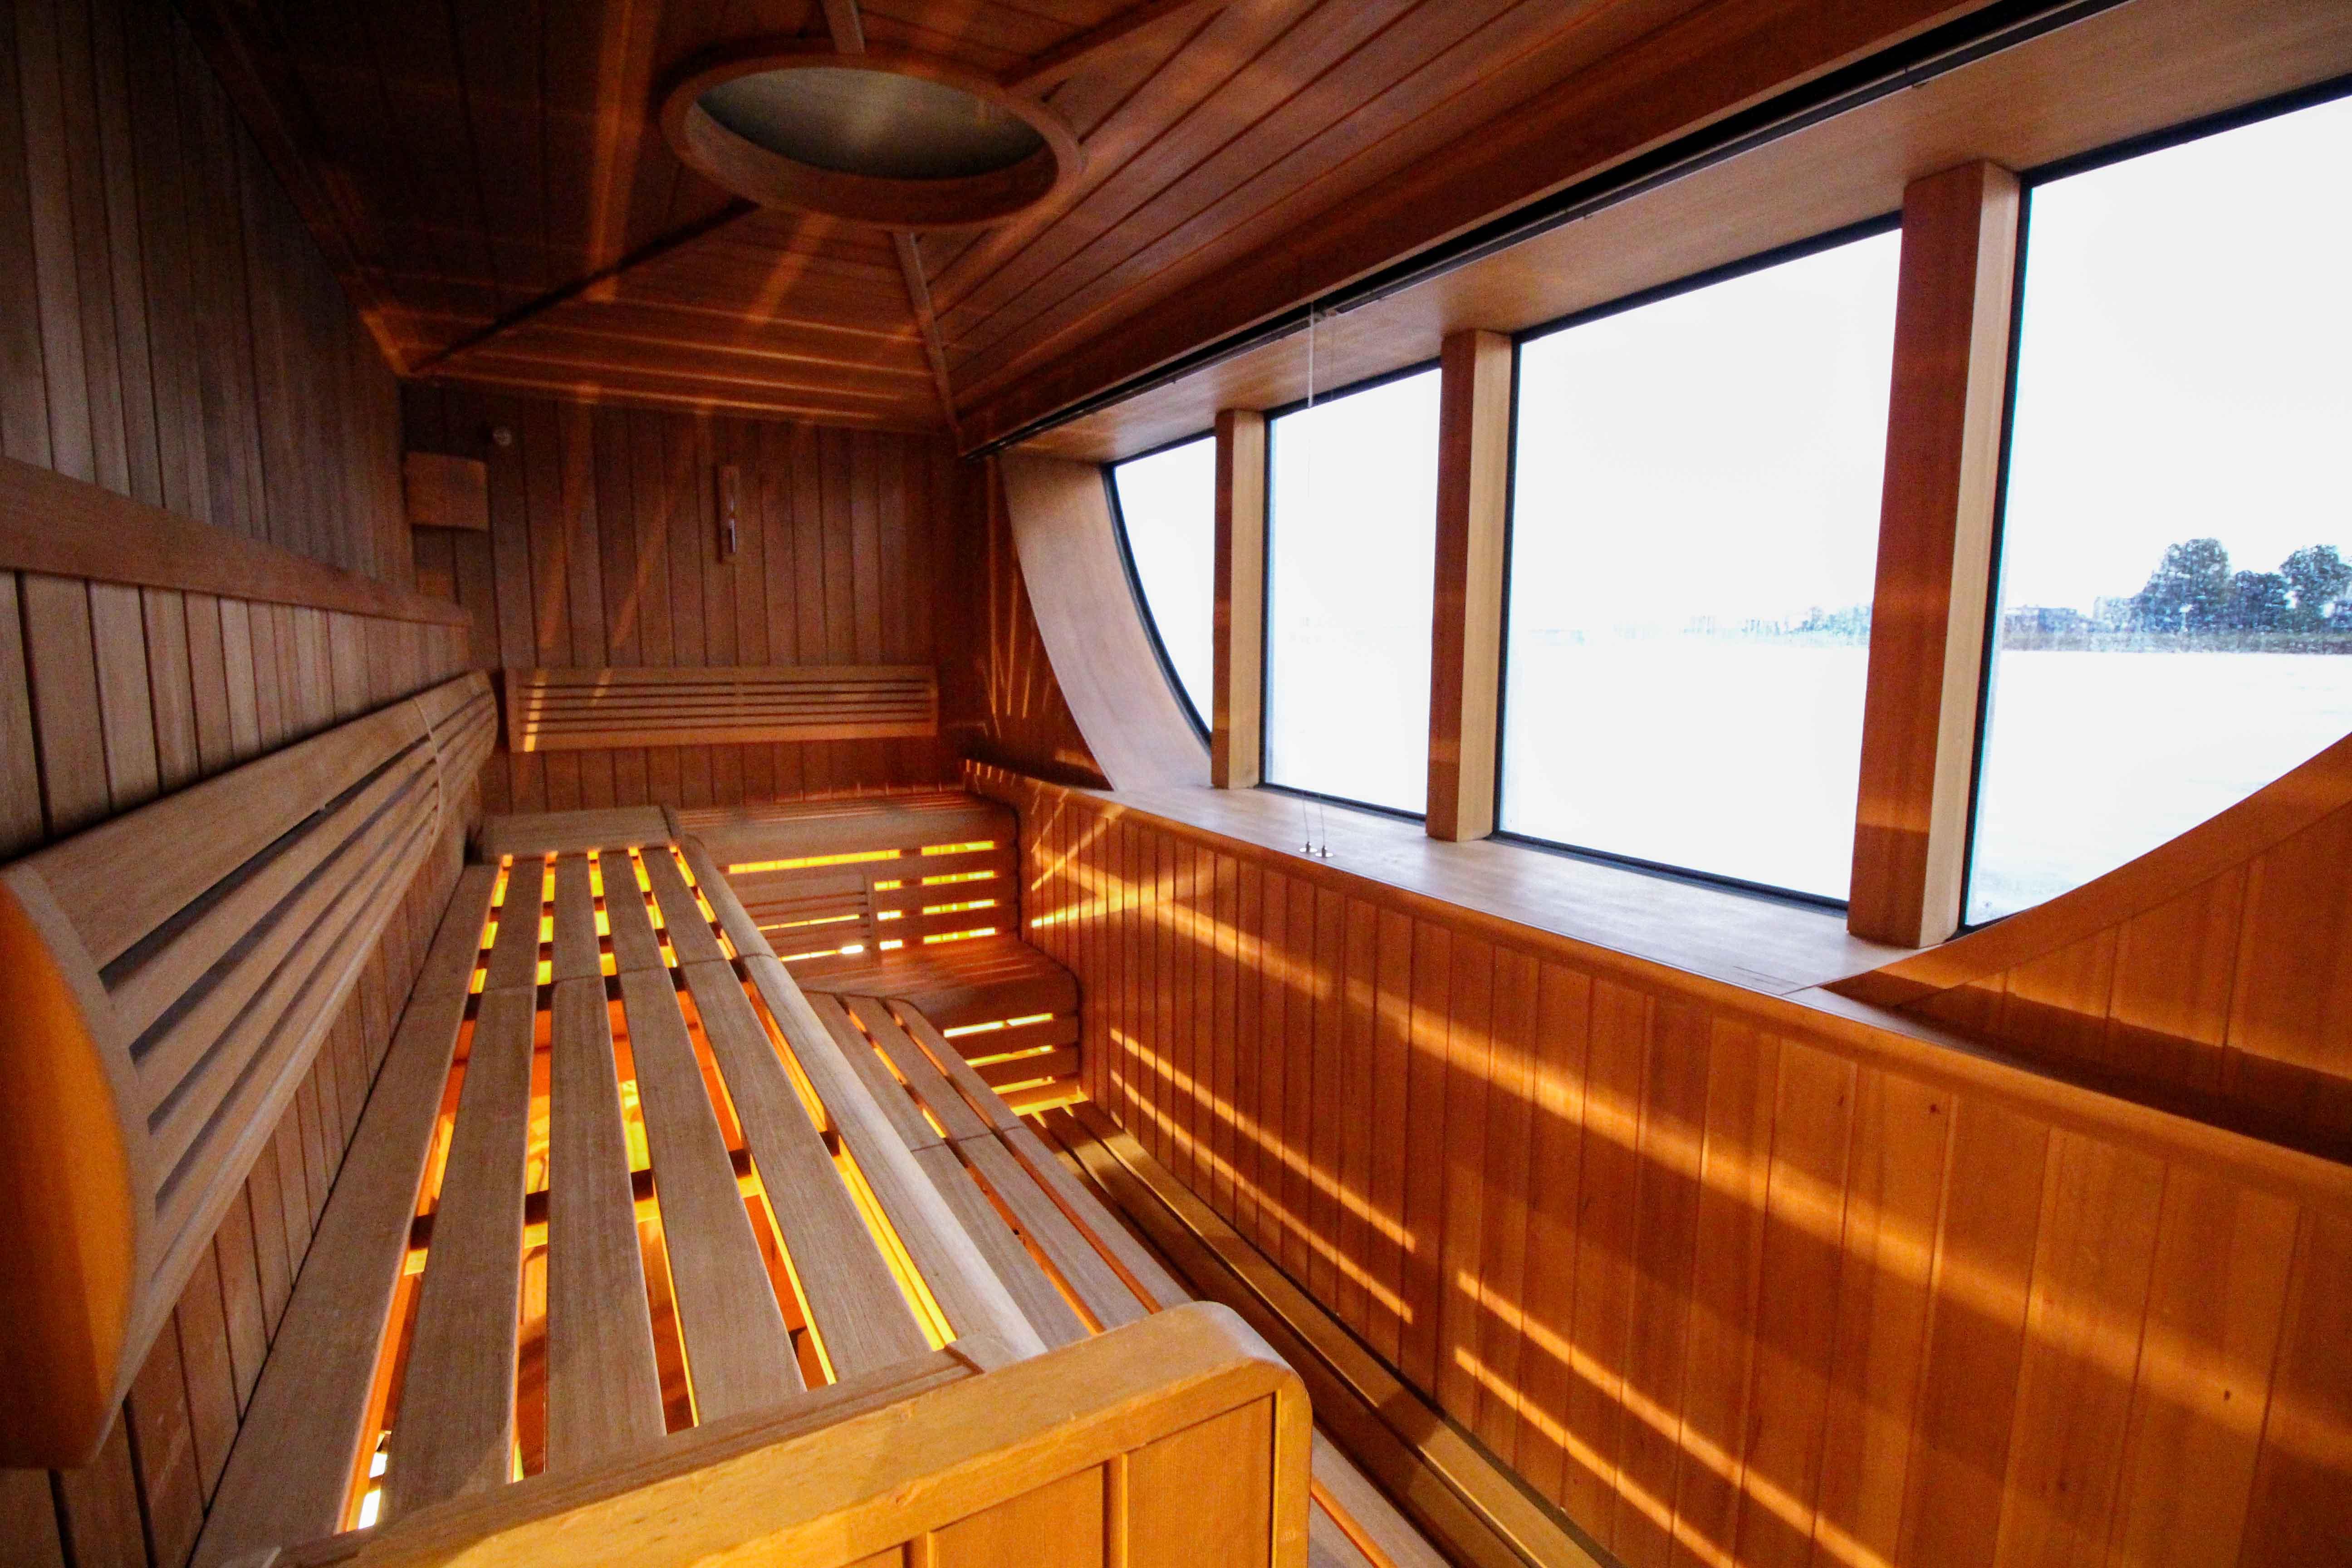 Flusskreuzfahrt A-ROSA SILVA Kreuzfahrtschiff Rhein Erlebnis Kurs Amsterdam Wellnessbereich Sauna Erfahrung Flusskreuzfahrt Reiseblog.jpg